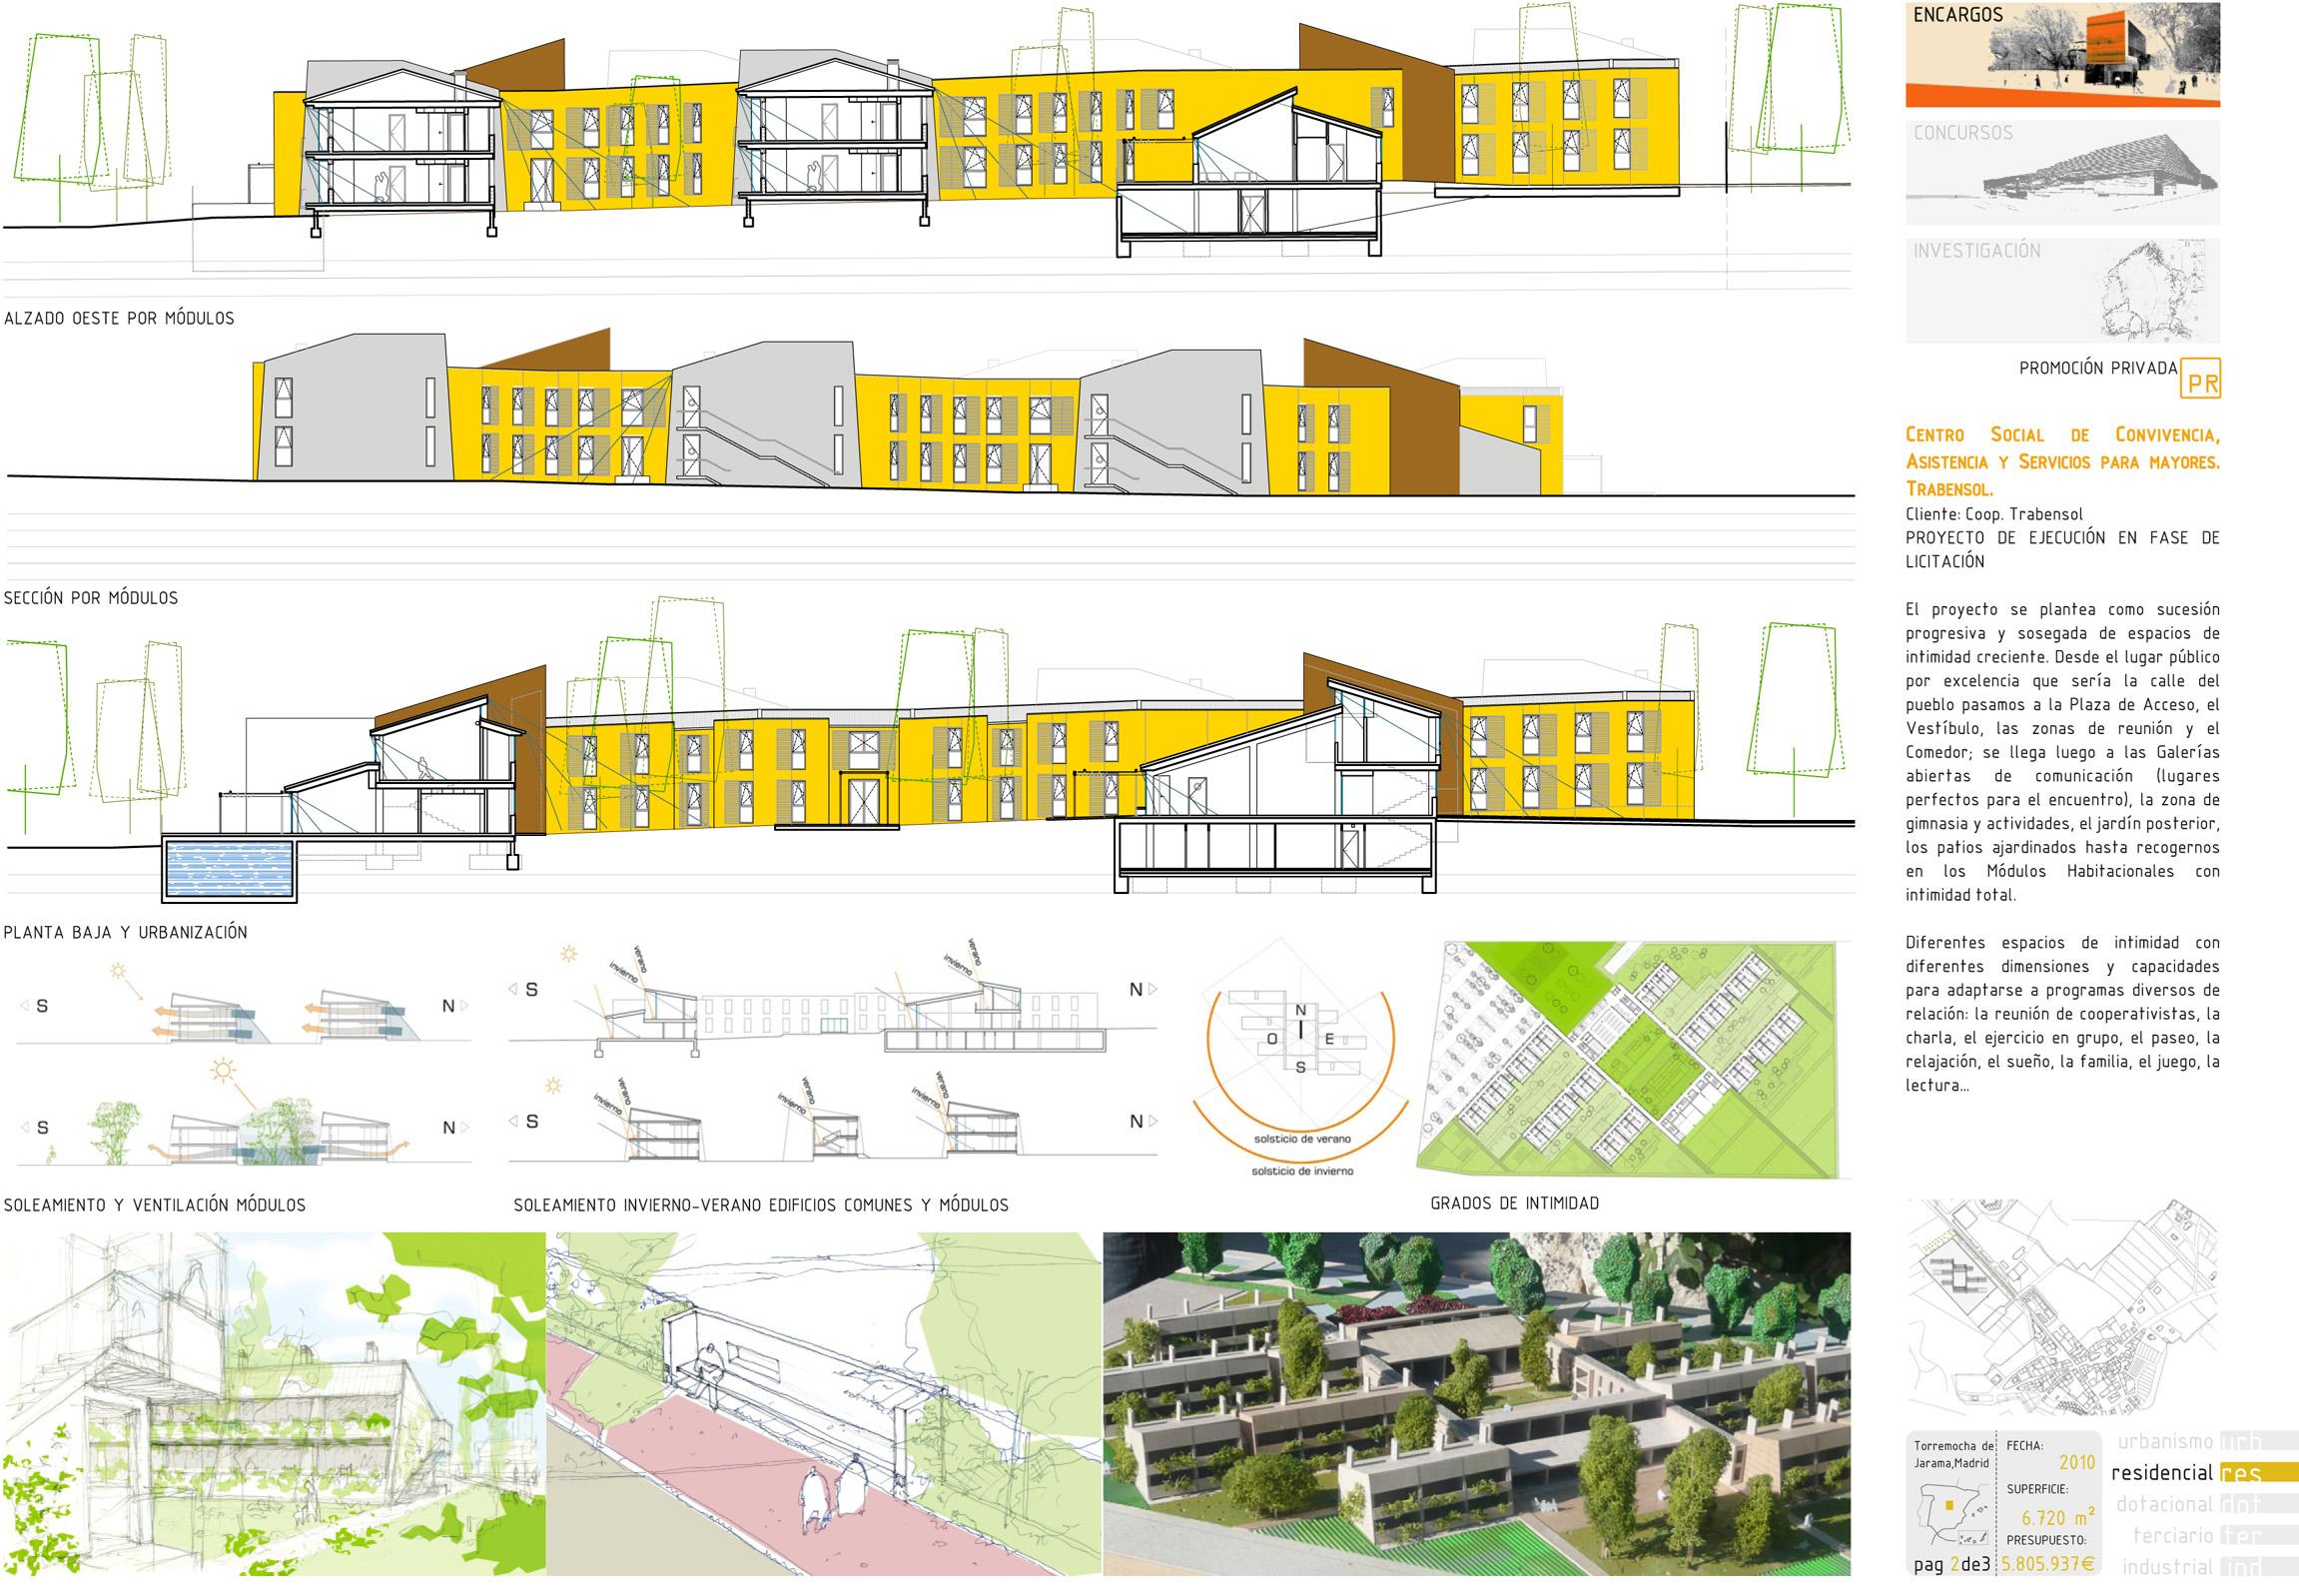 Ecohousing proyecto de arquitectura del centro de mayores for Plan de arquitectura